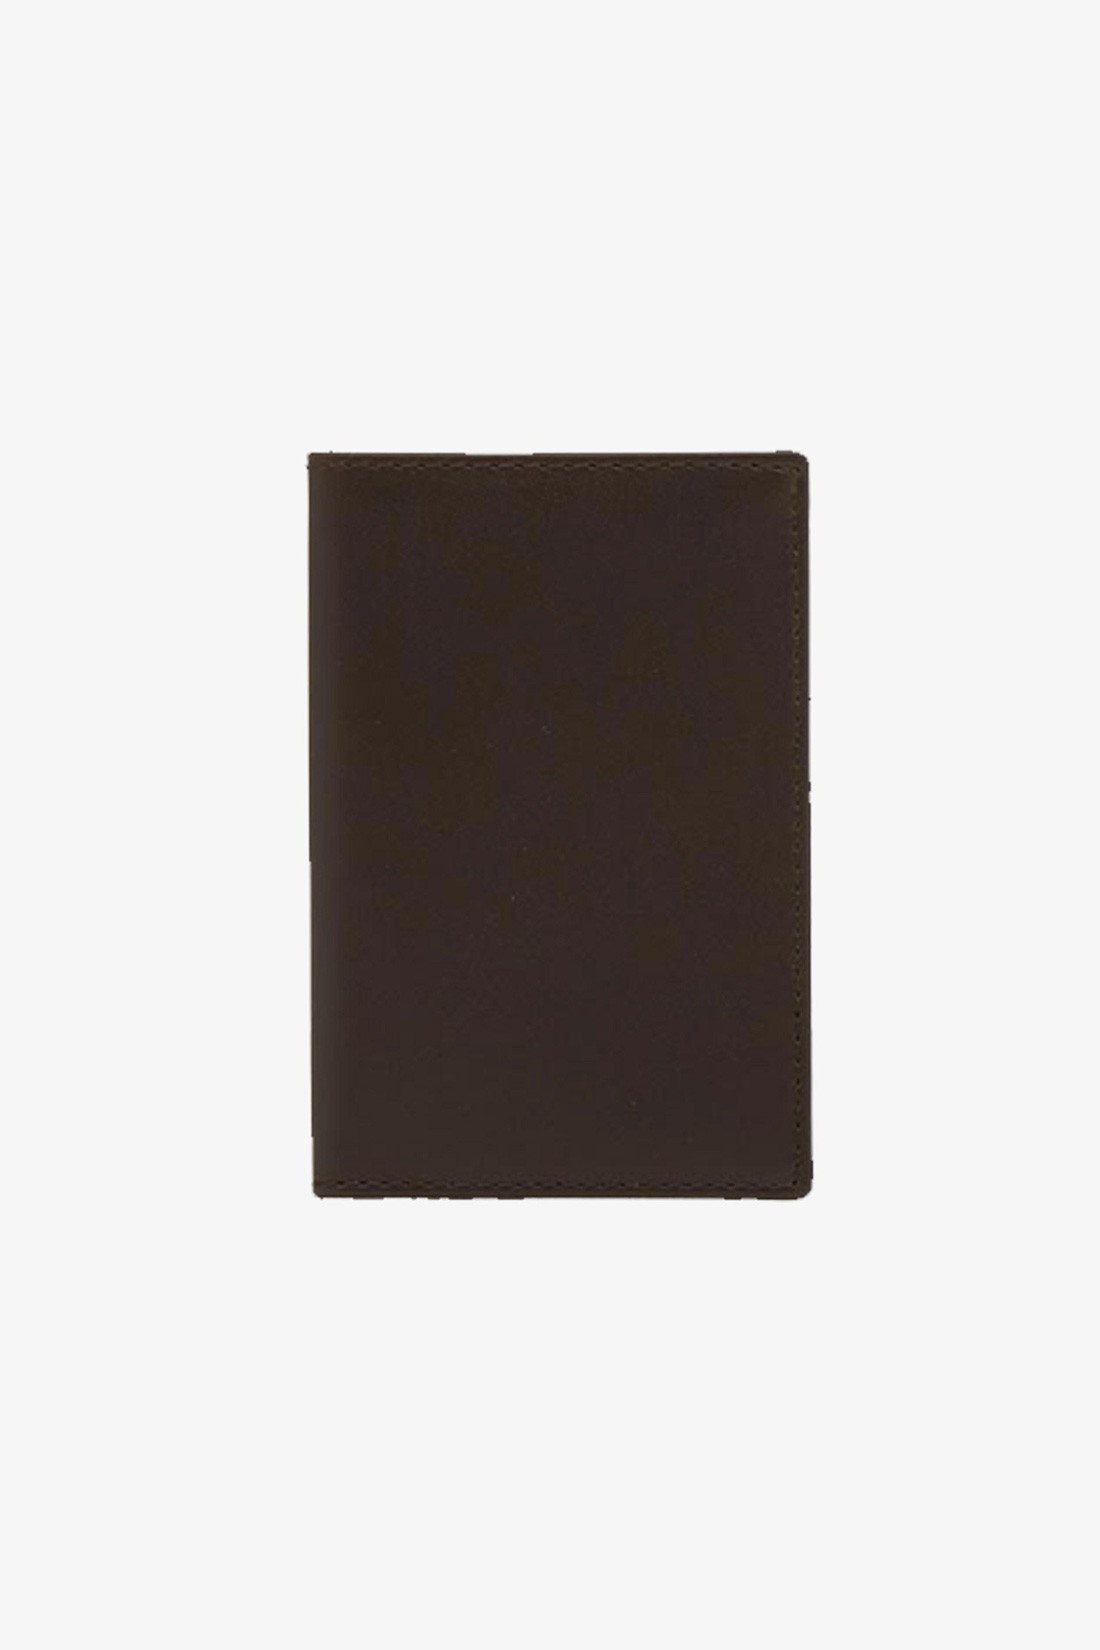 COMME DES GARÇONS WALLETS / Cdg leather wallet classic Brown